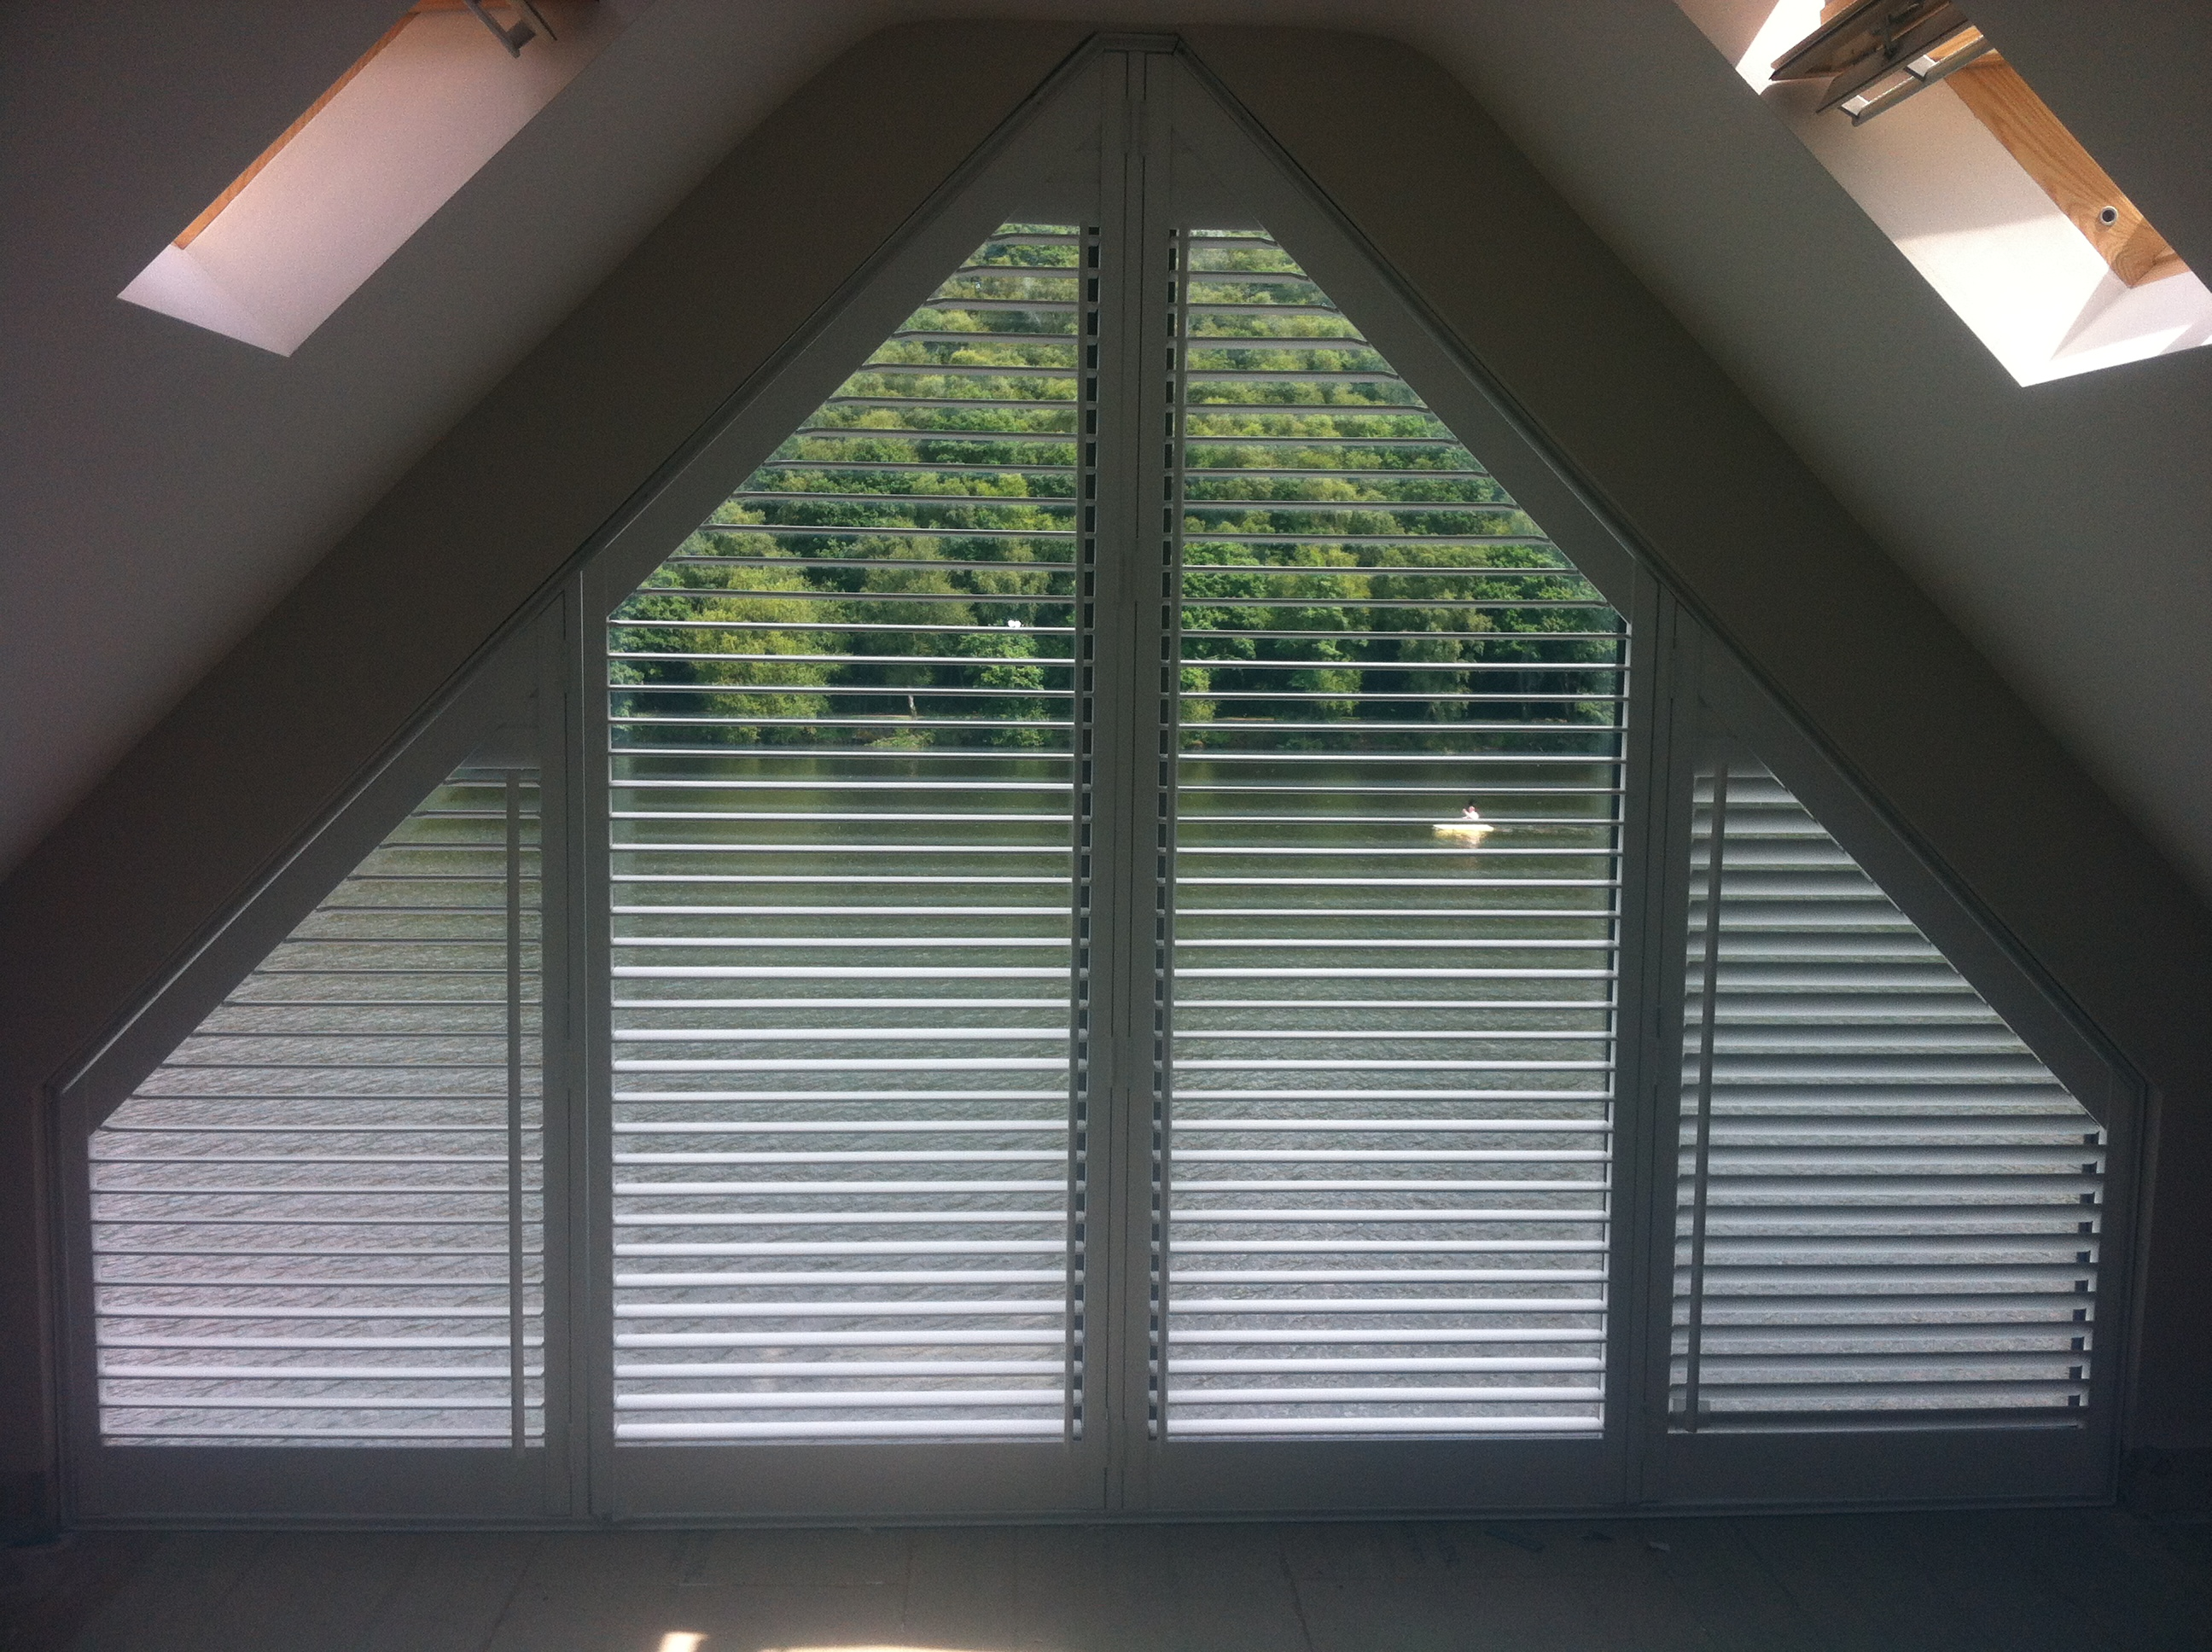 window-shutters-angle-shutter